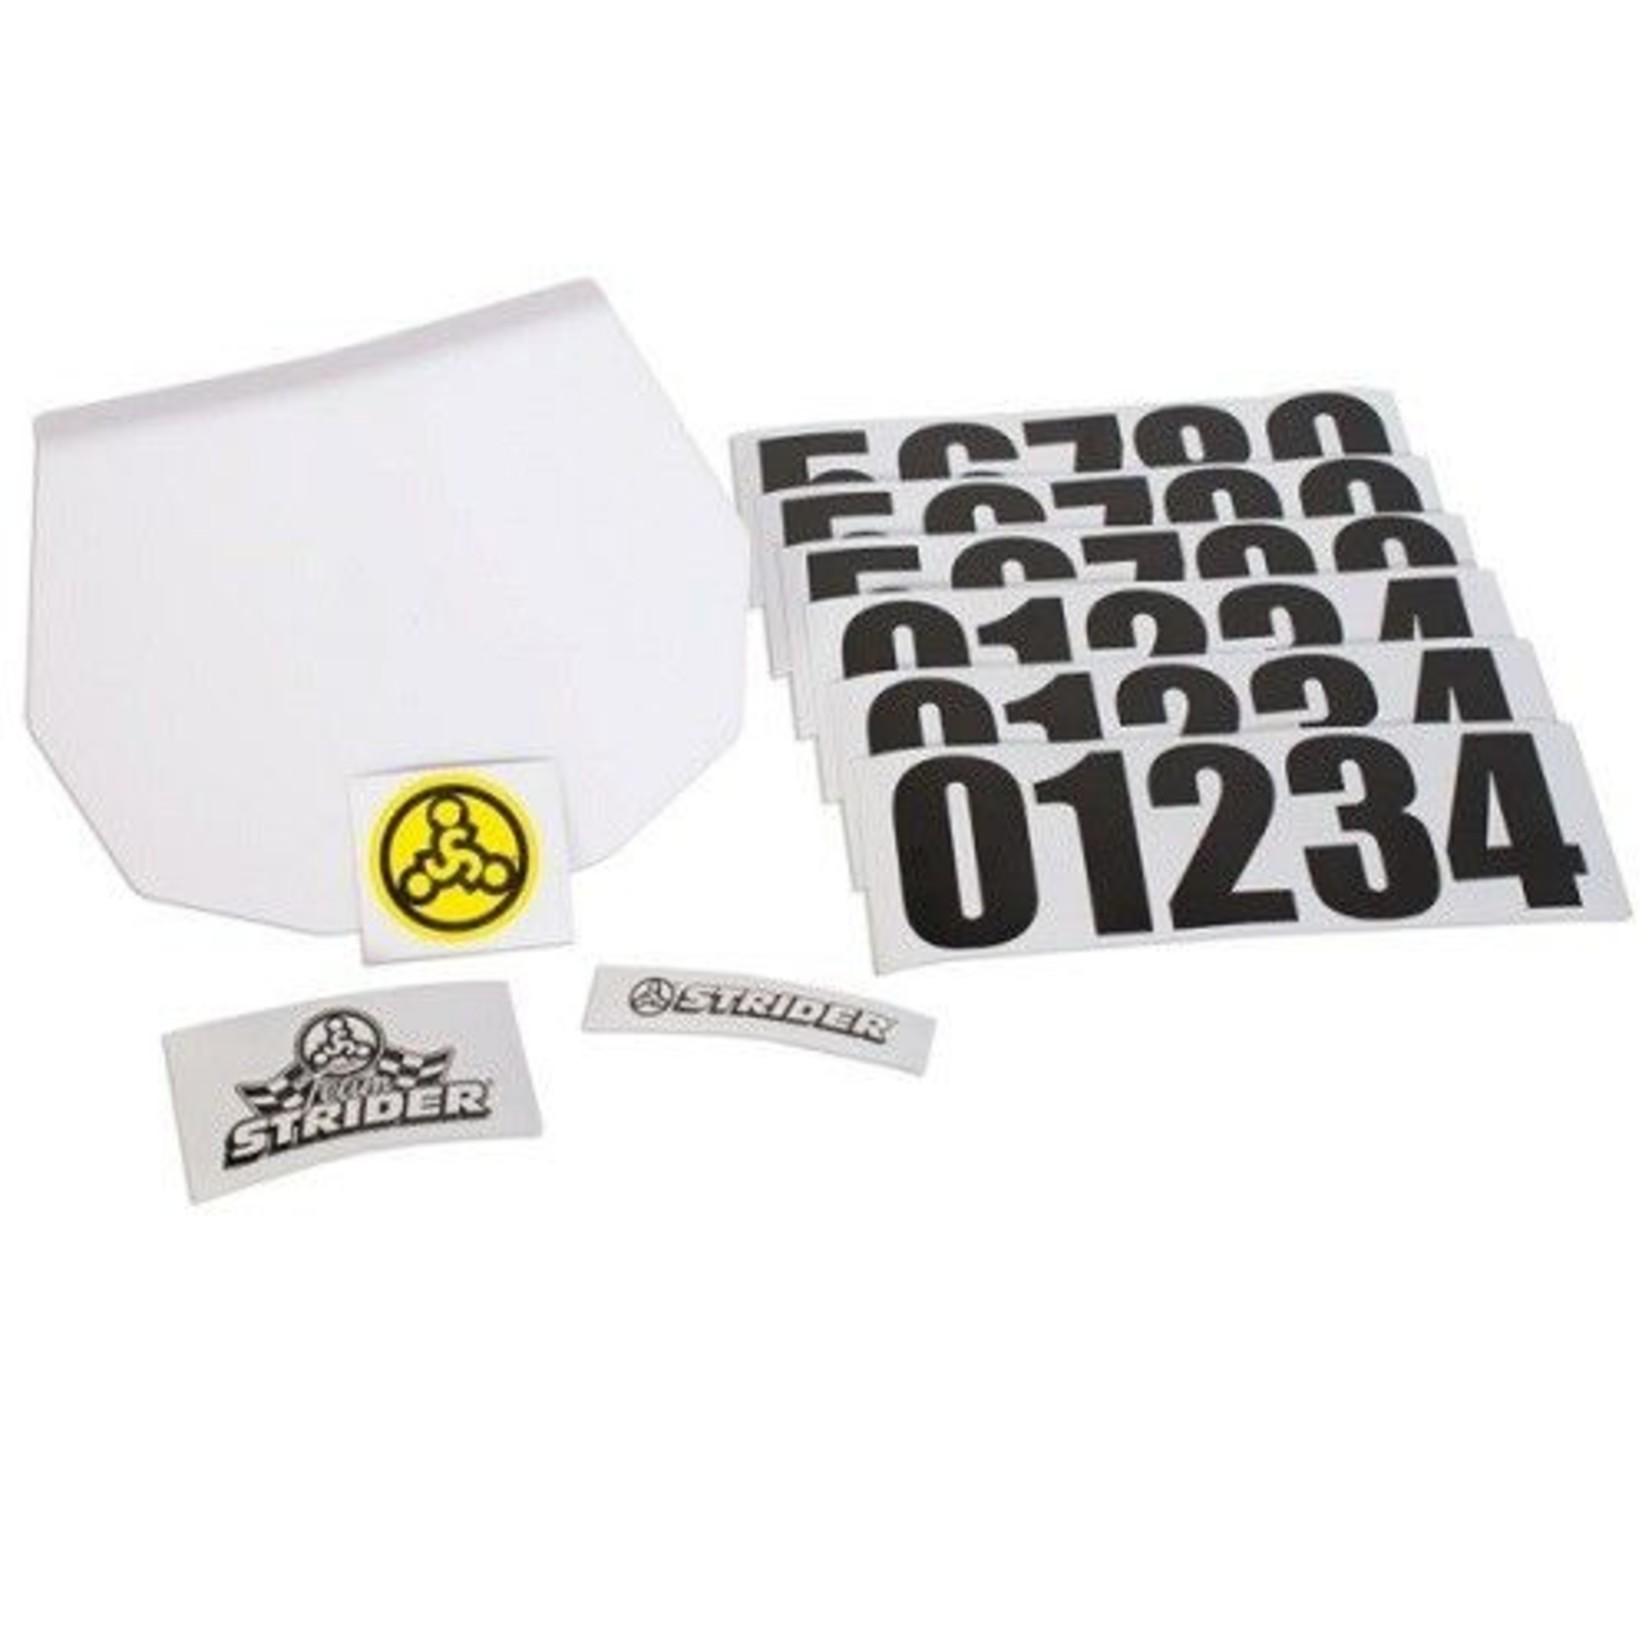 Strider Sports Strider Number Plate Kit